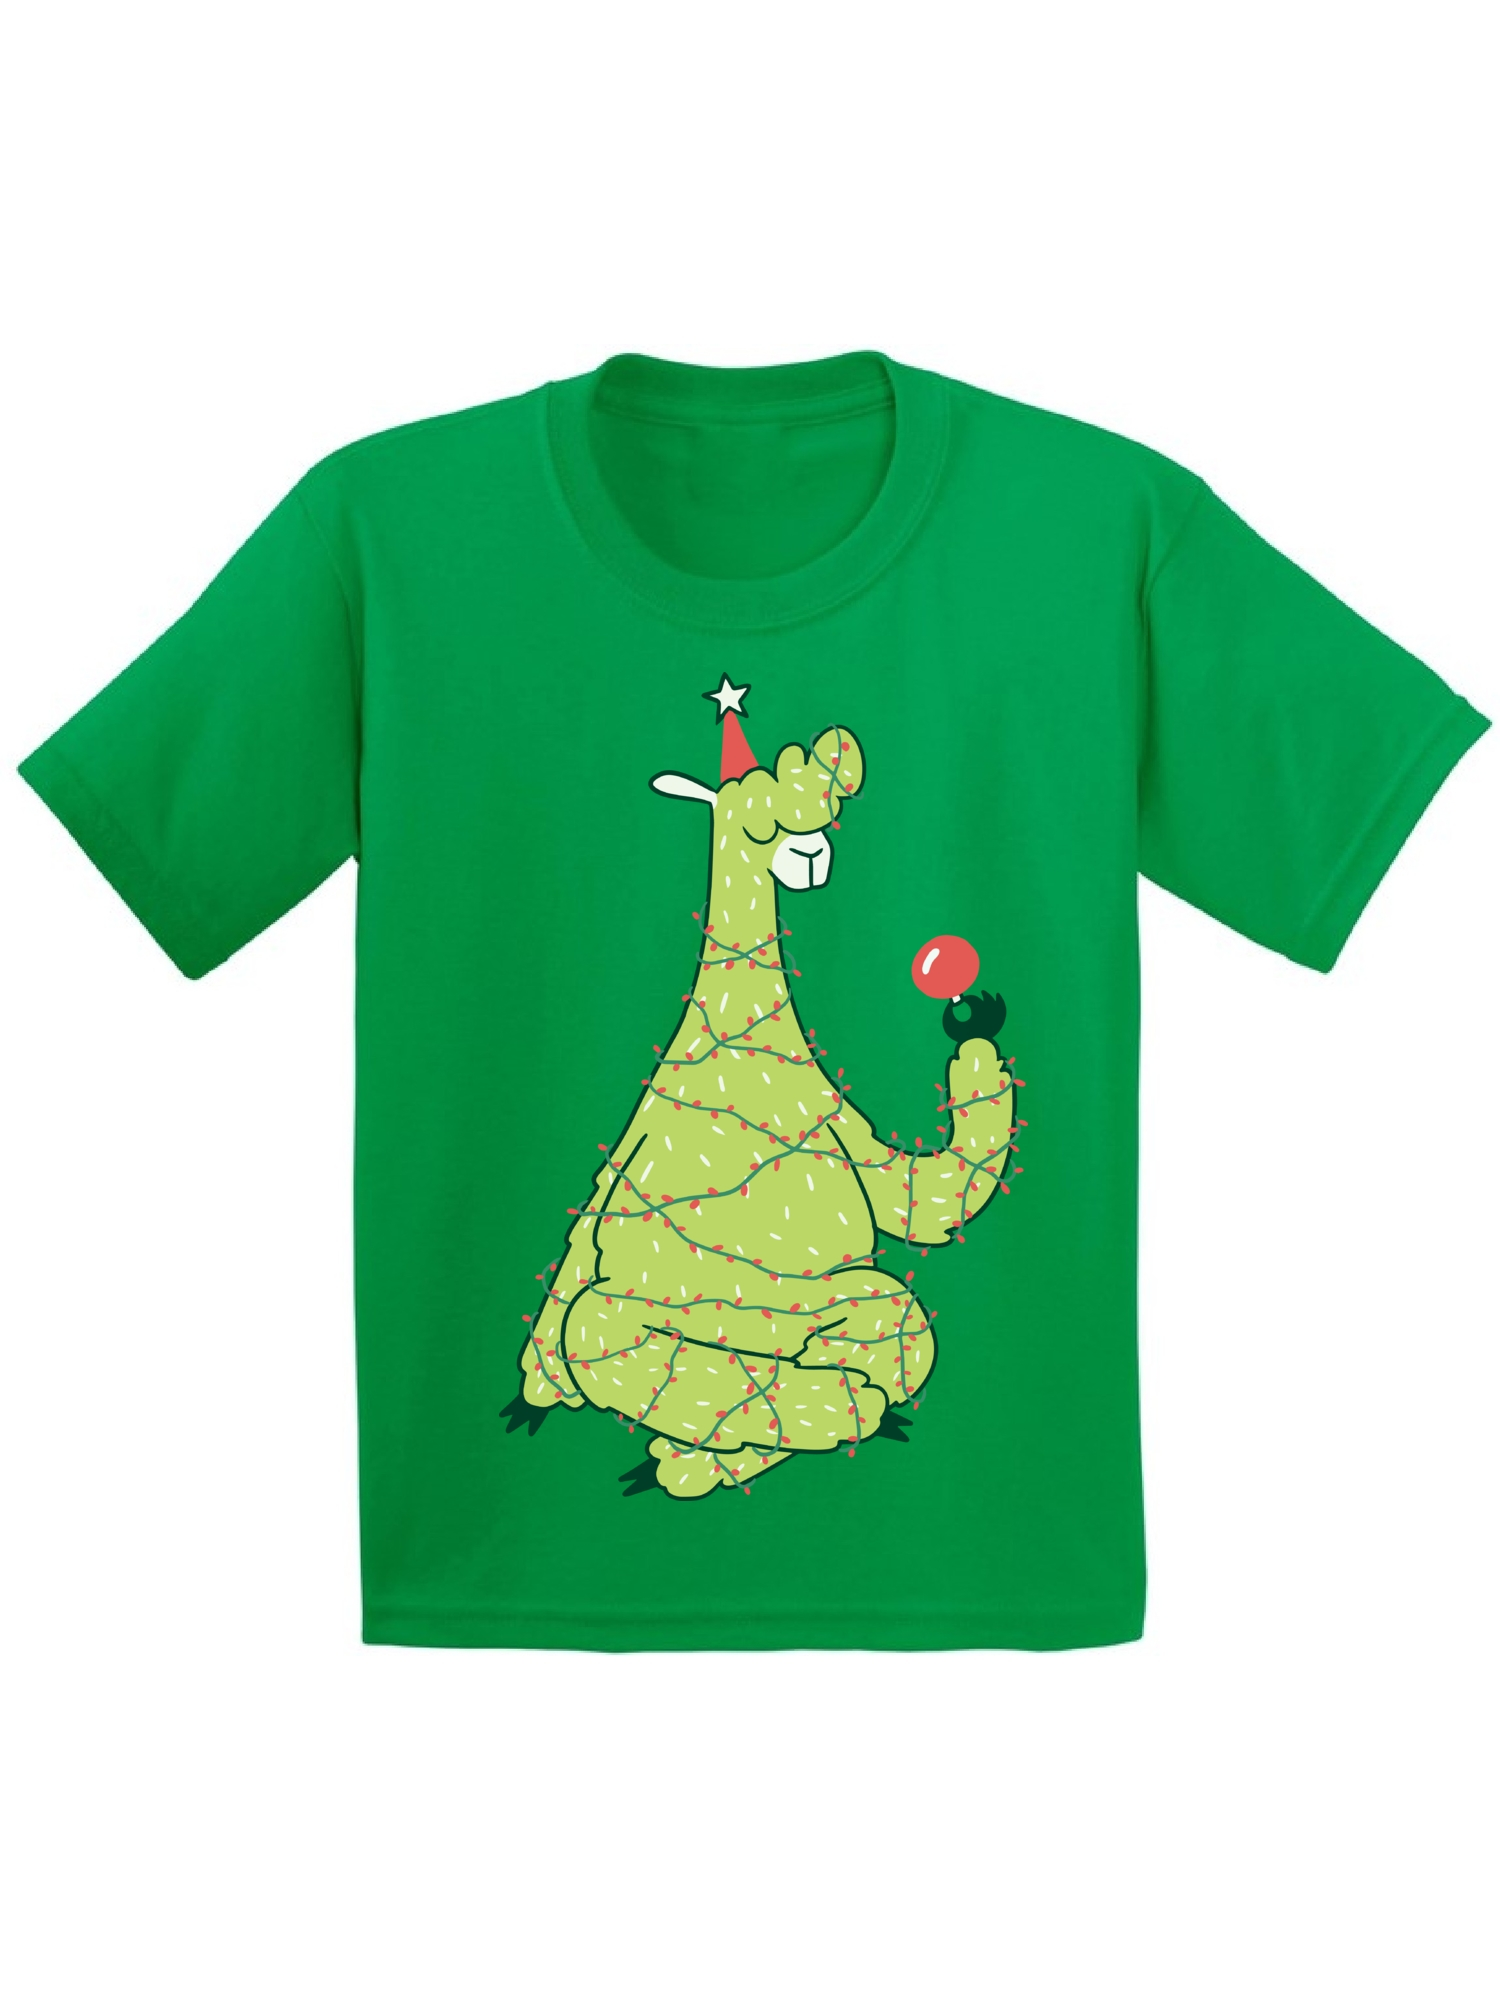 Personalized Llama Short Sleeve light green top w stripe pants Girly Llama Pajamas or design of your choice! UNISEX fit Pajamas